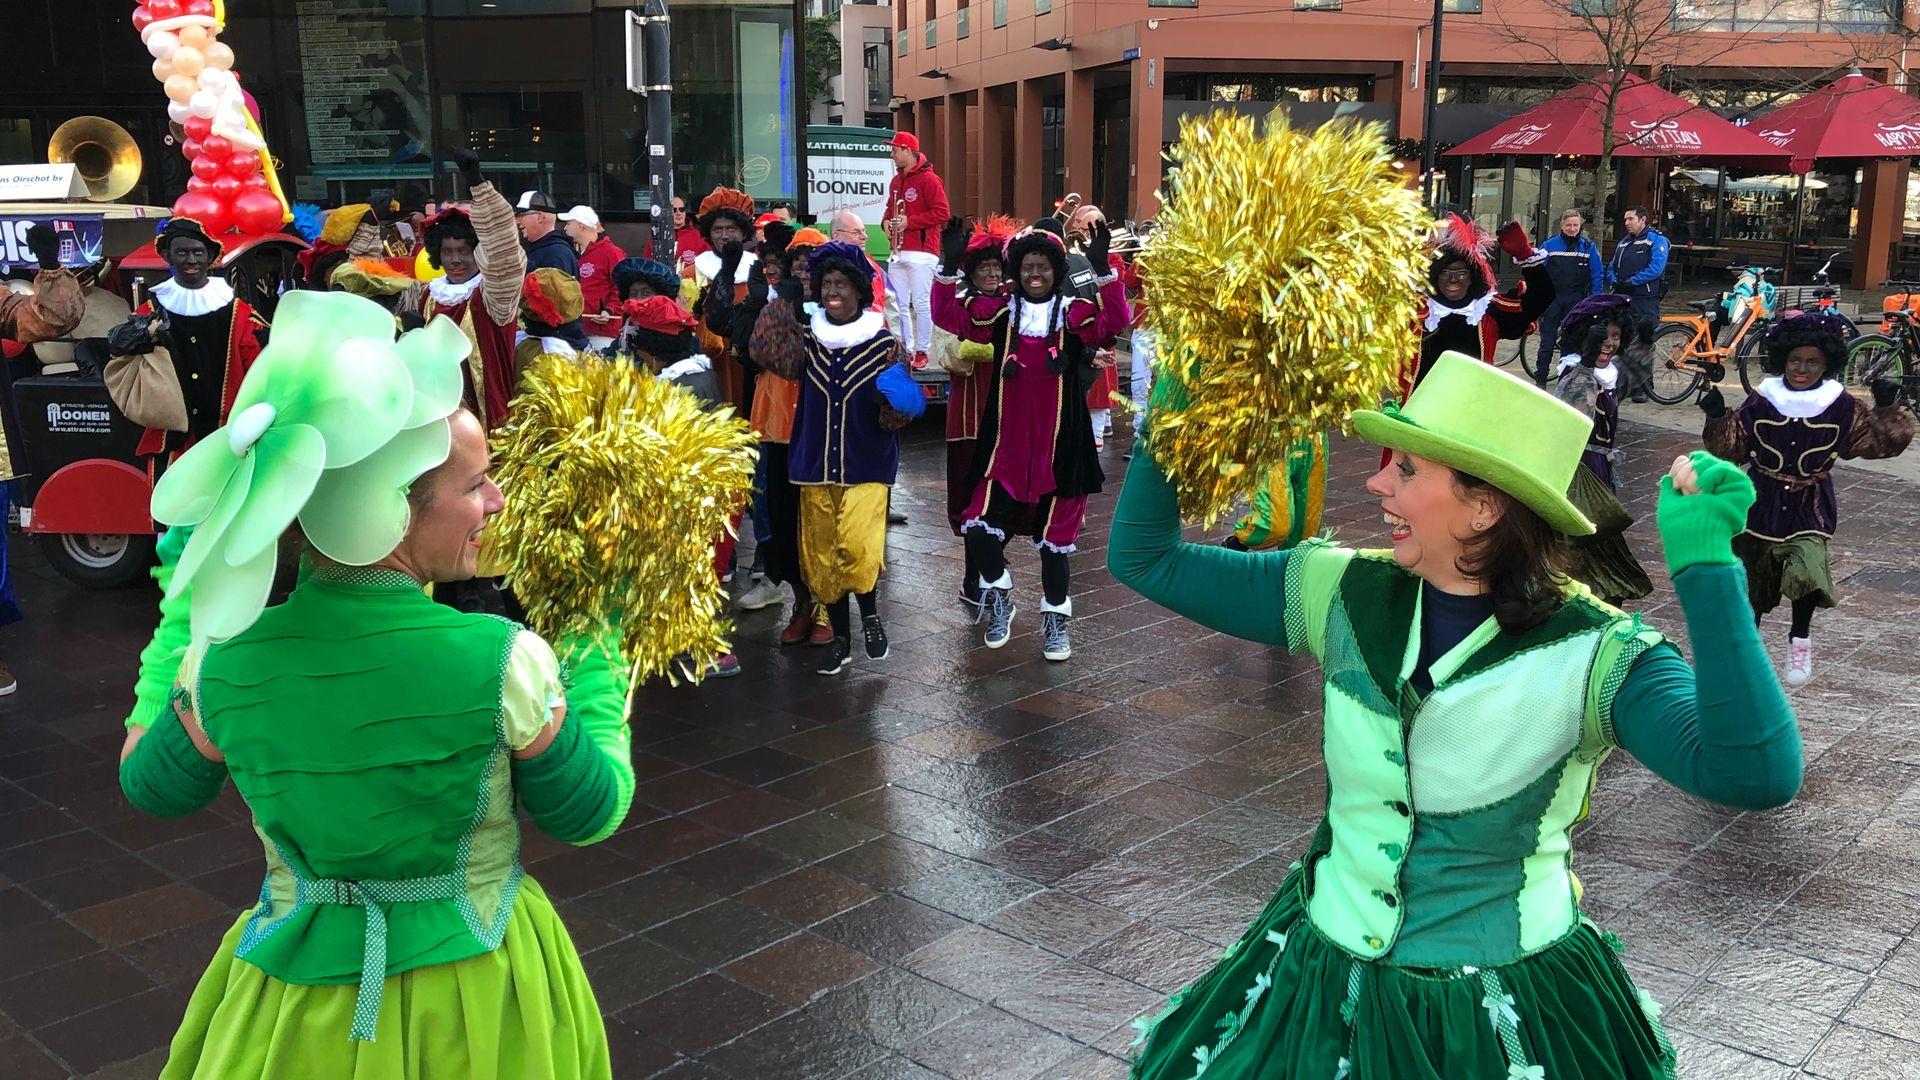 Pietennparade Dansen